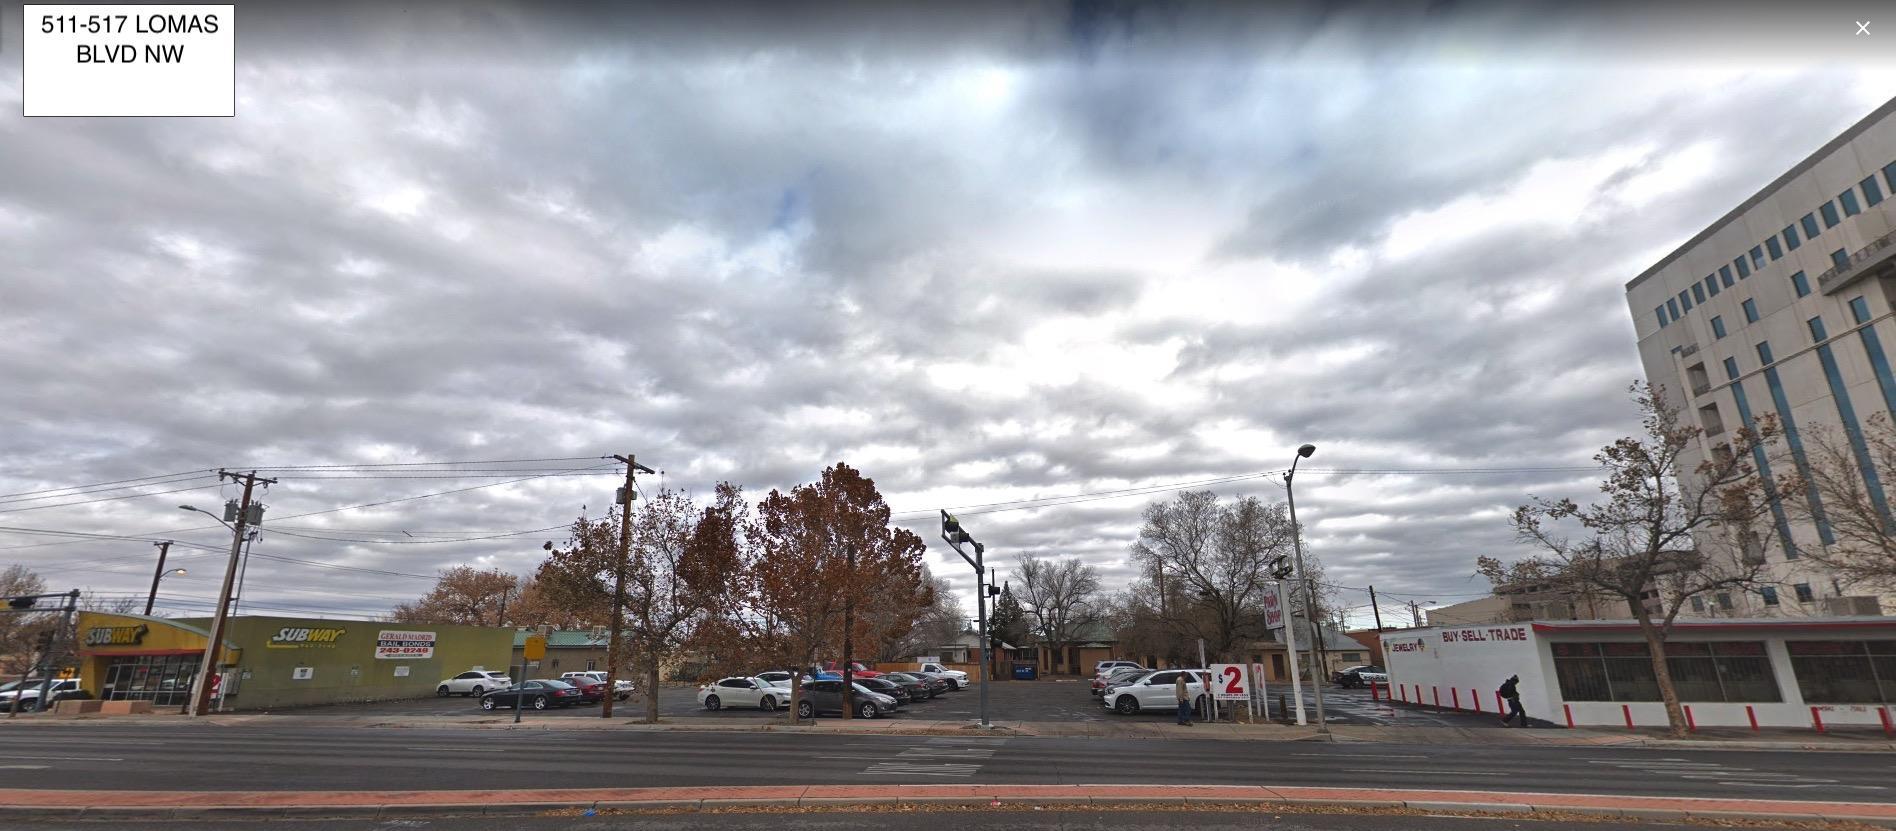 513 Lomas Boulevard Nw Property Photo